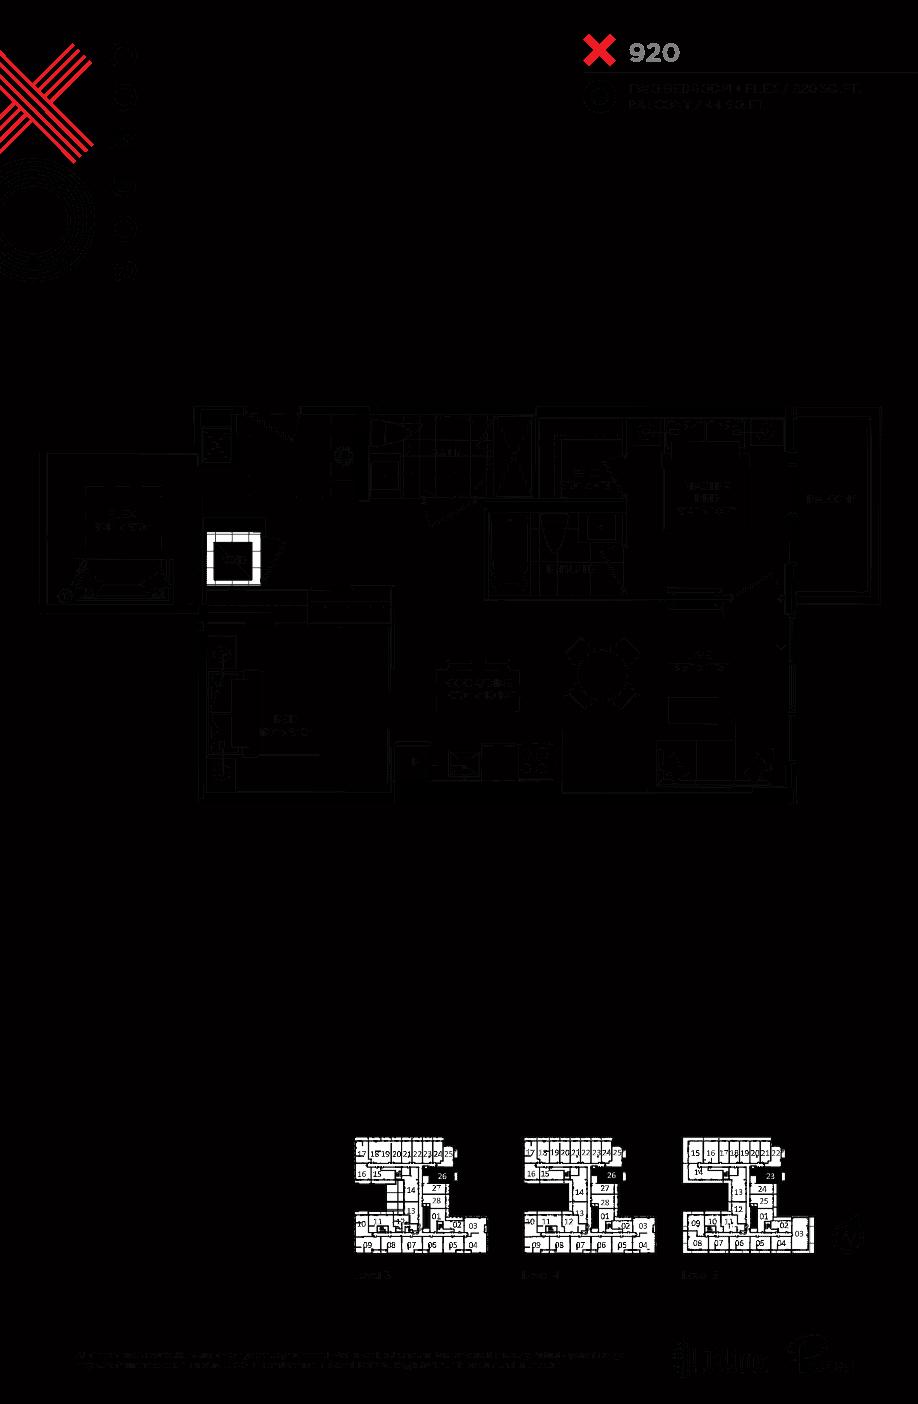 2019 04 09 03 14 04 xo condos floor plans part15 1